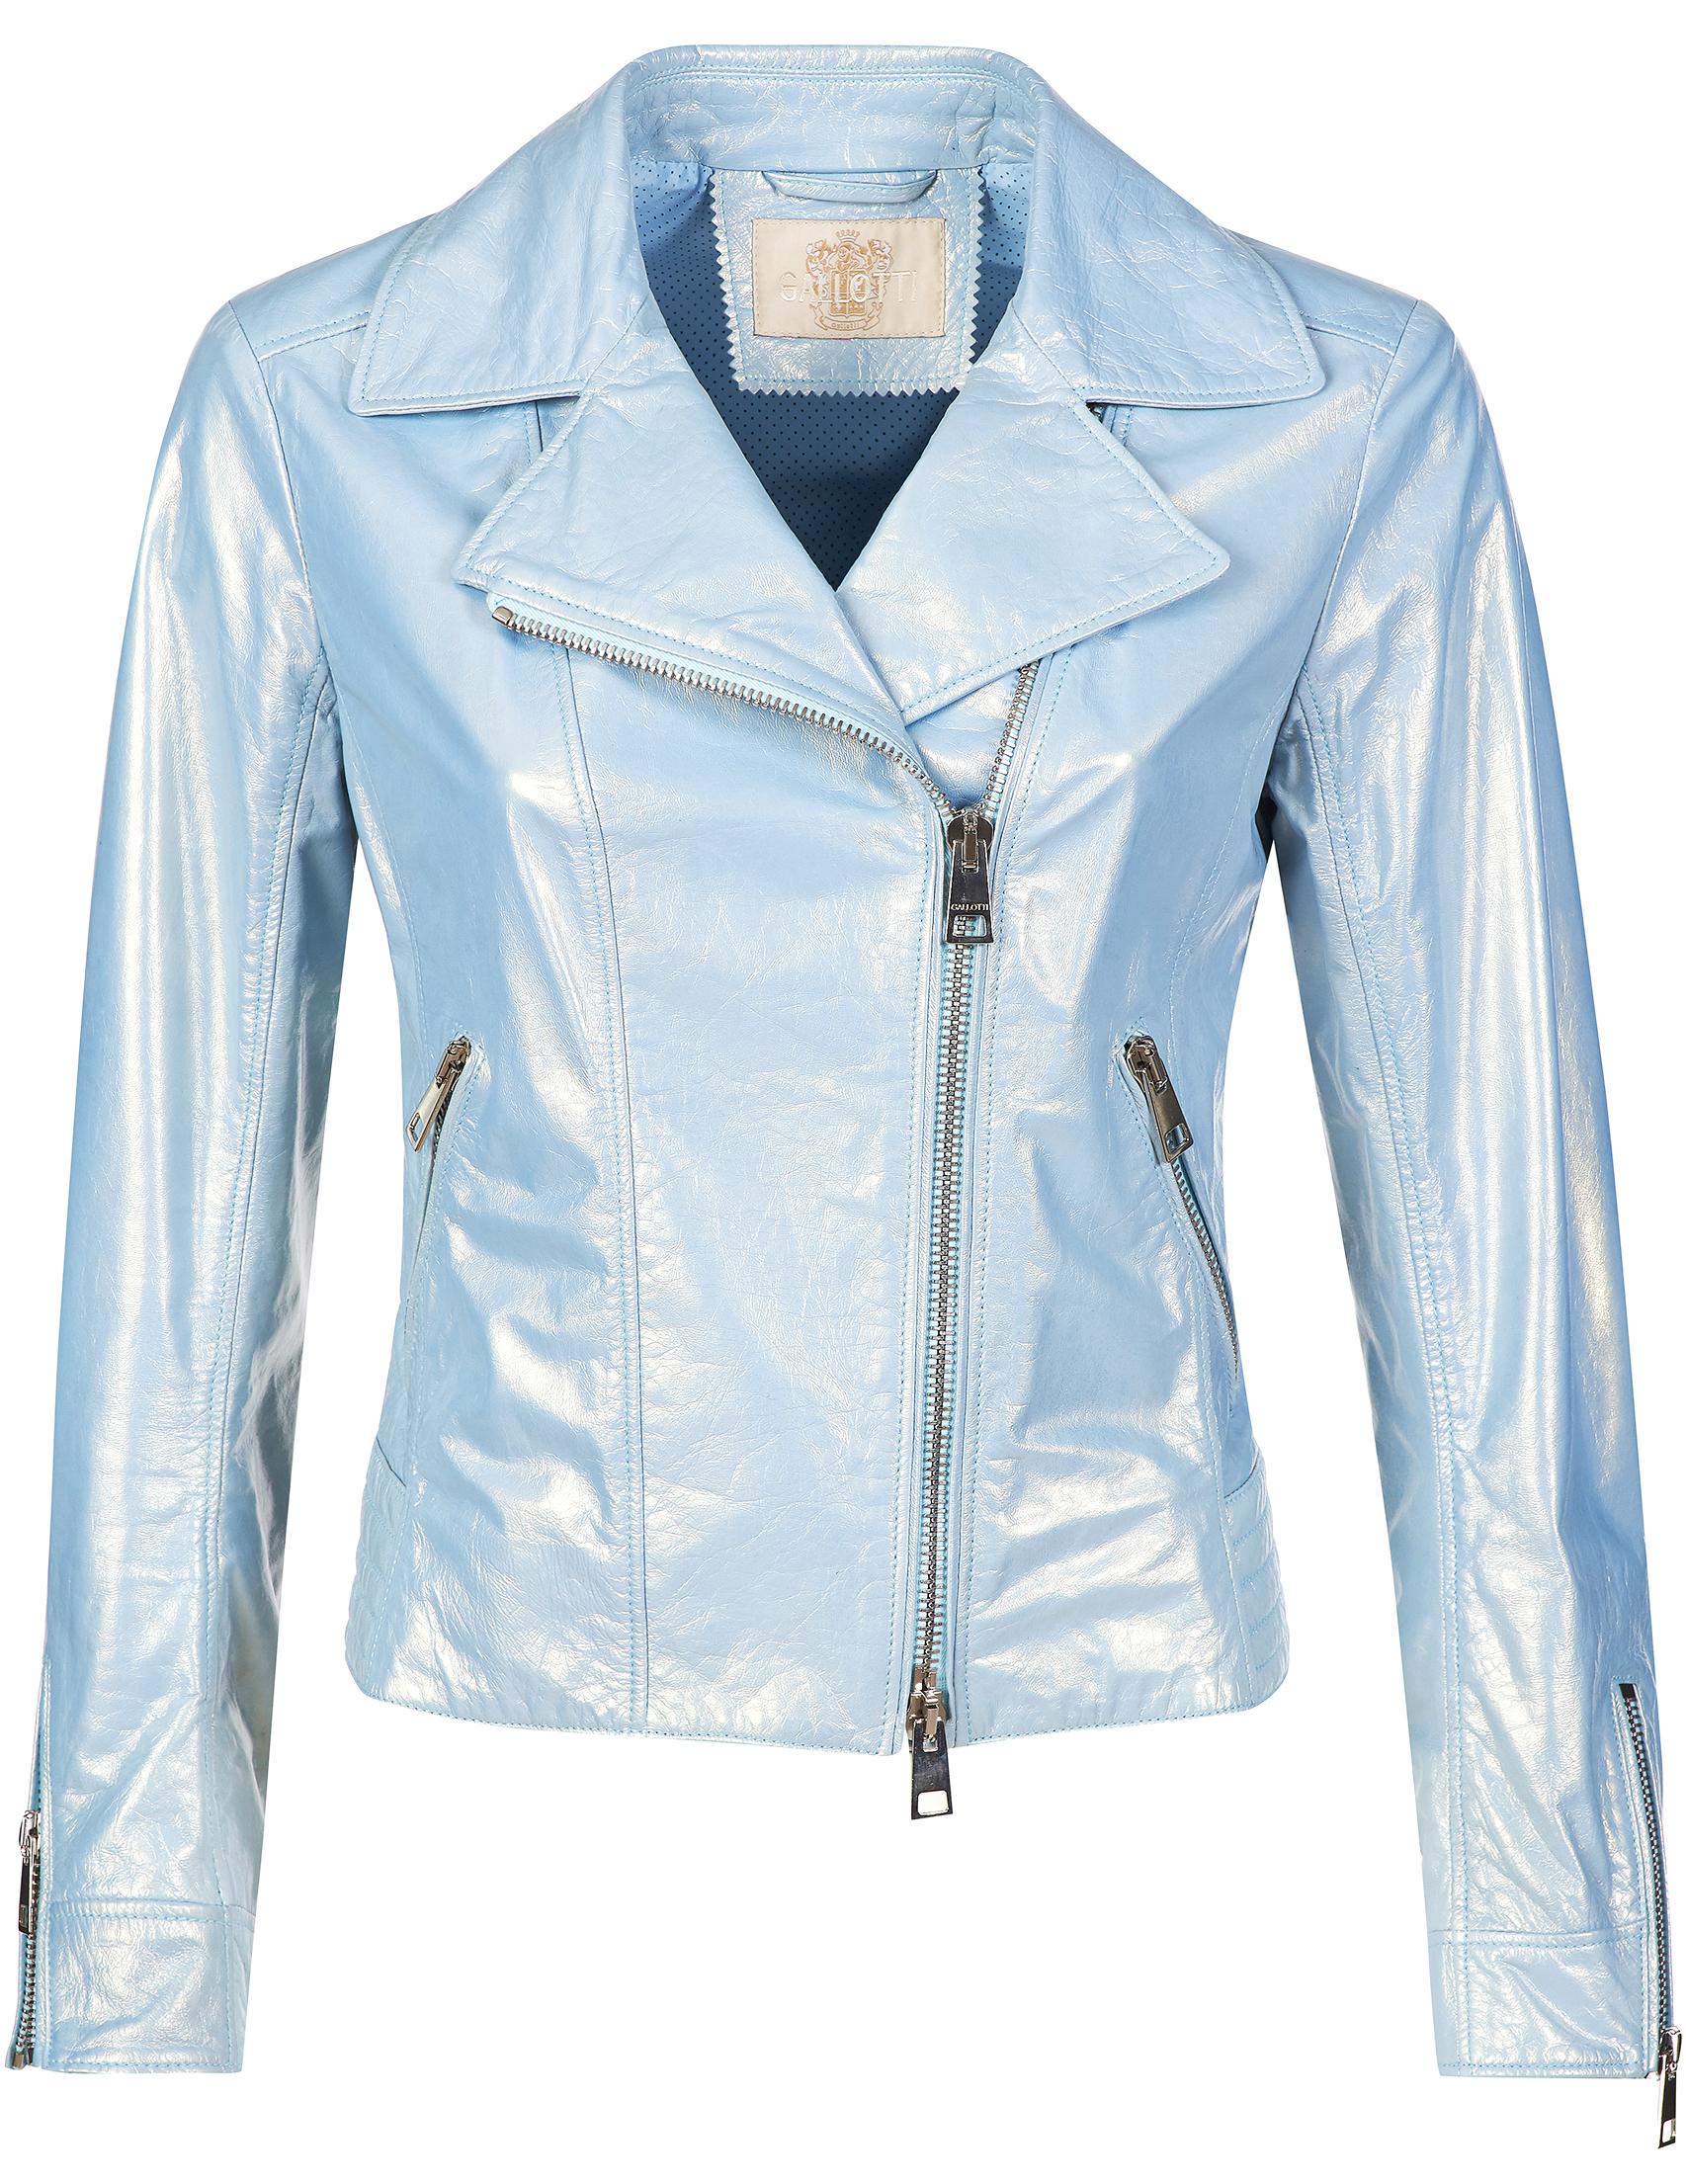 Купить Куртки, Куртка, GALLOTTI, Голубой, 100%Полиэстер, Осень-Зима